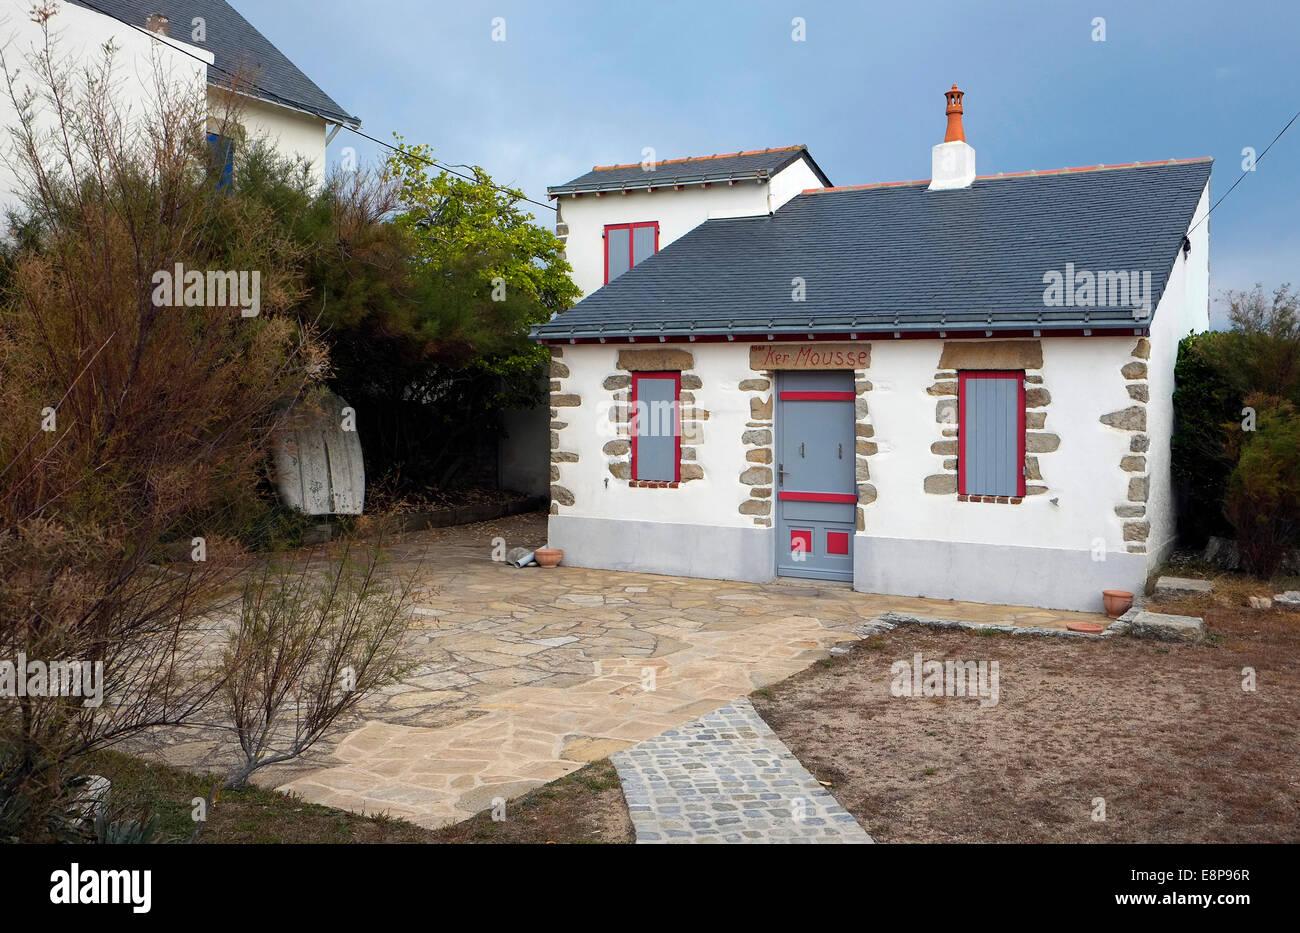 seaside holiday gite, batz-sur-mer, loire atlantique, france - Stock Image